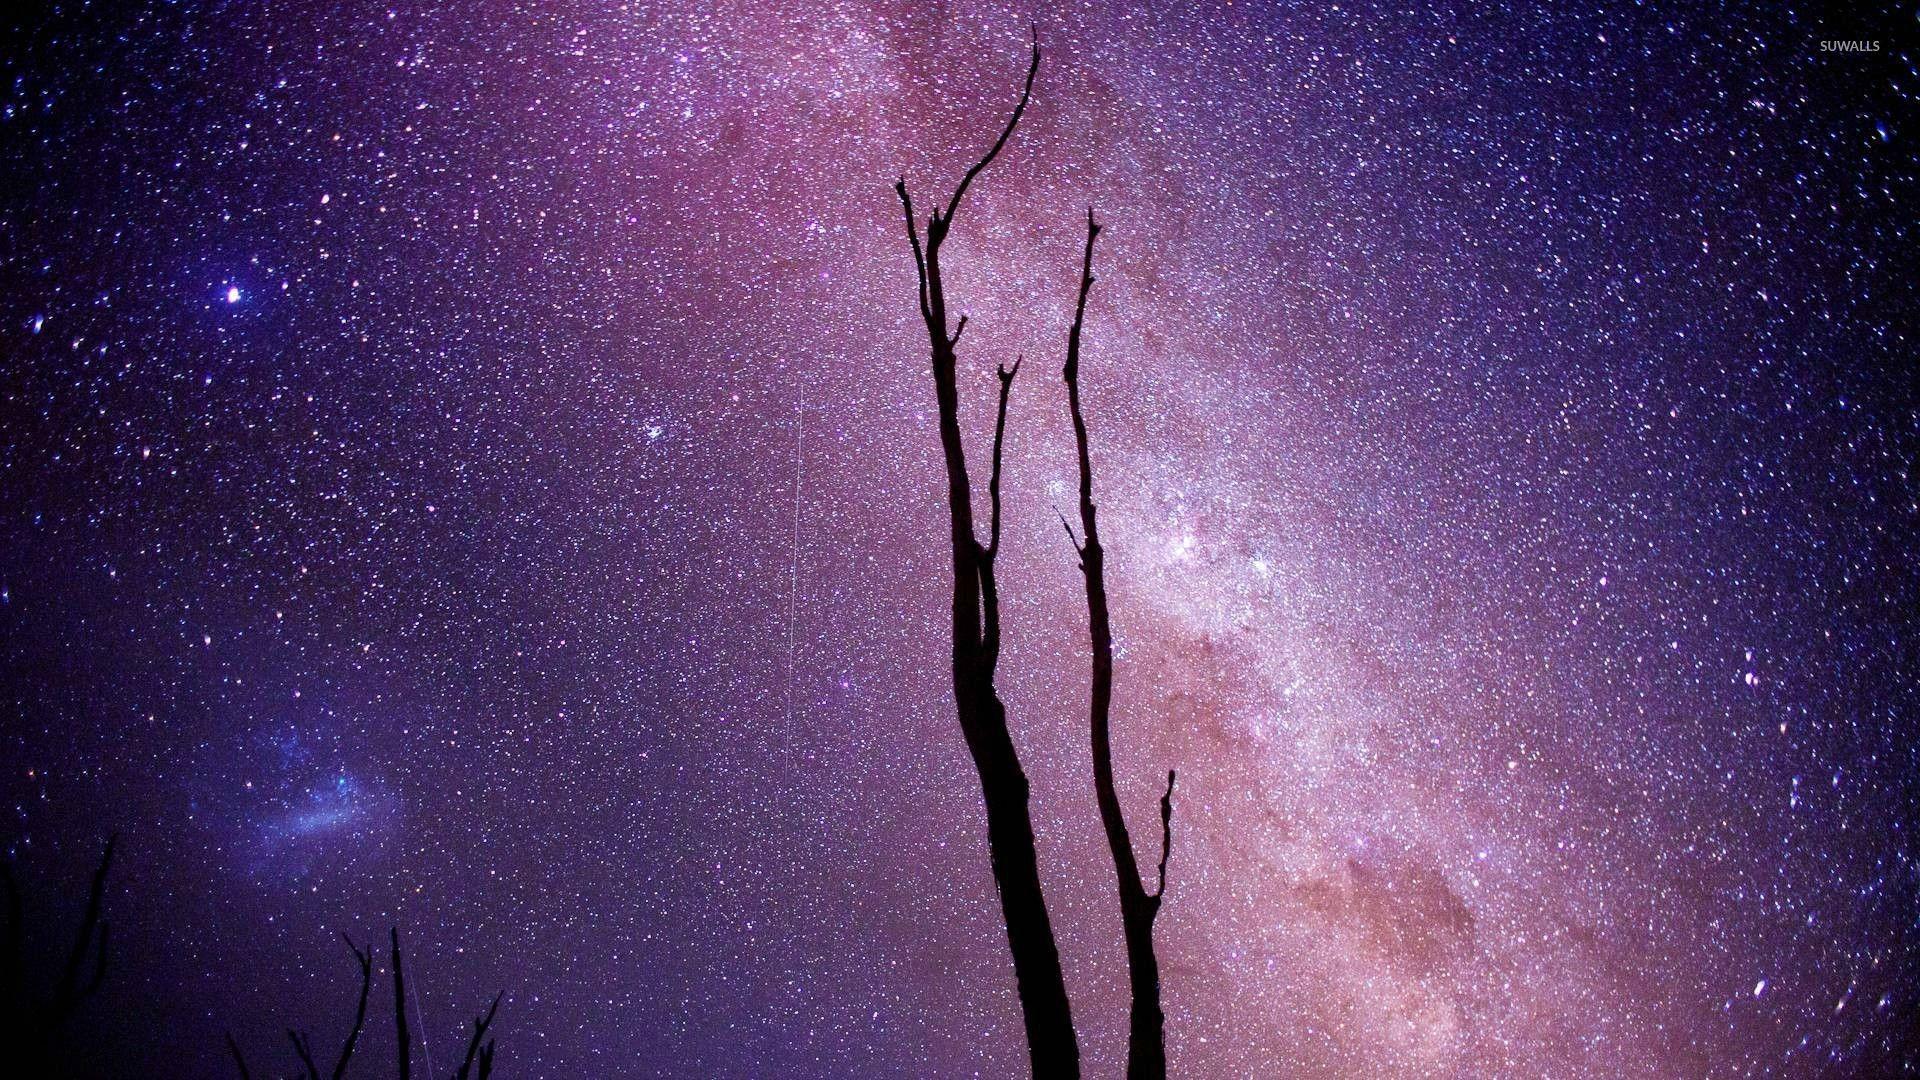 Milky Way above the trees wallpaper jpg